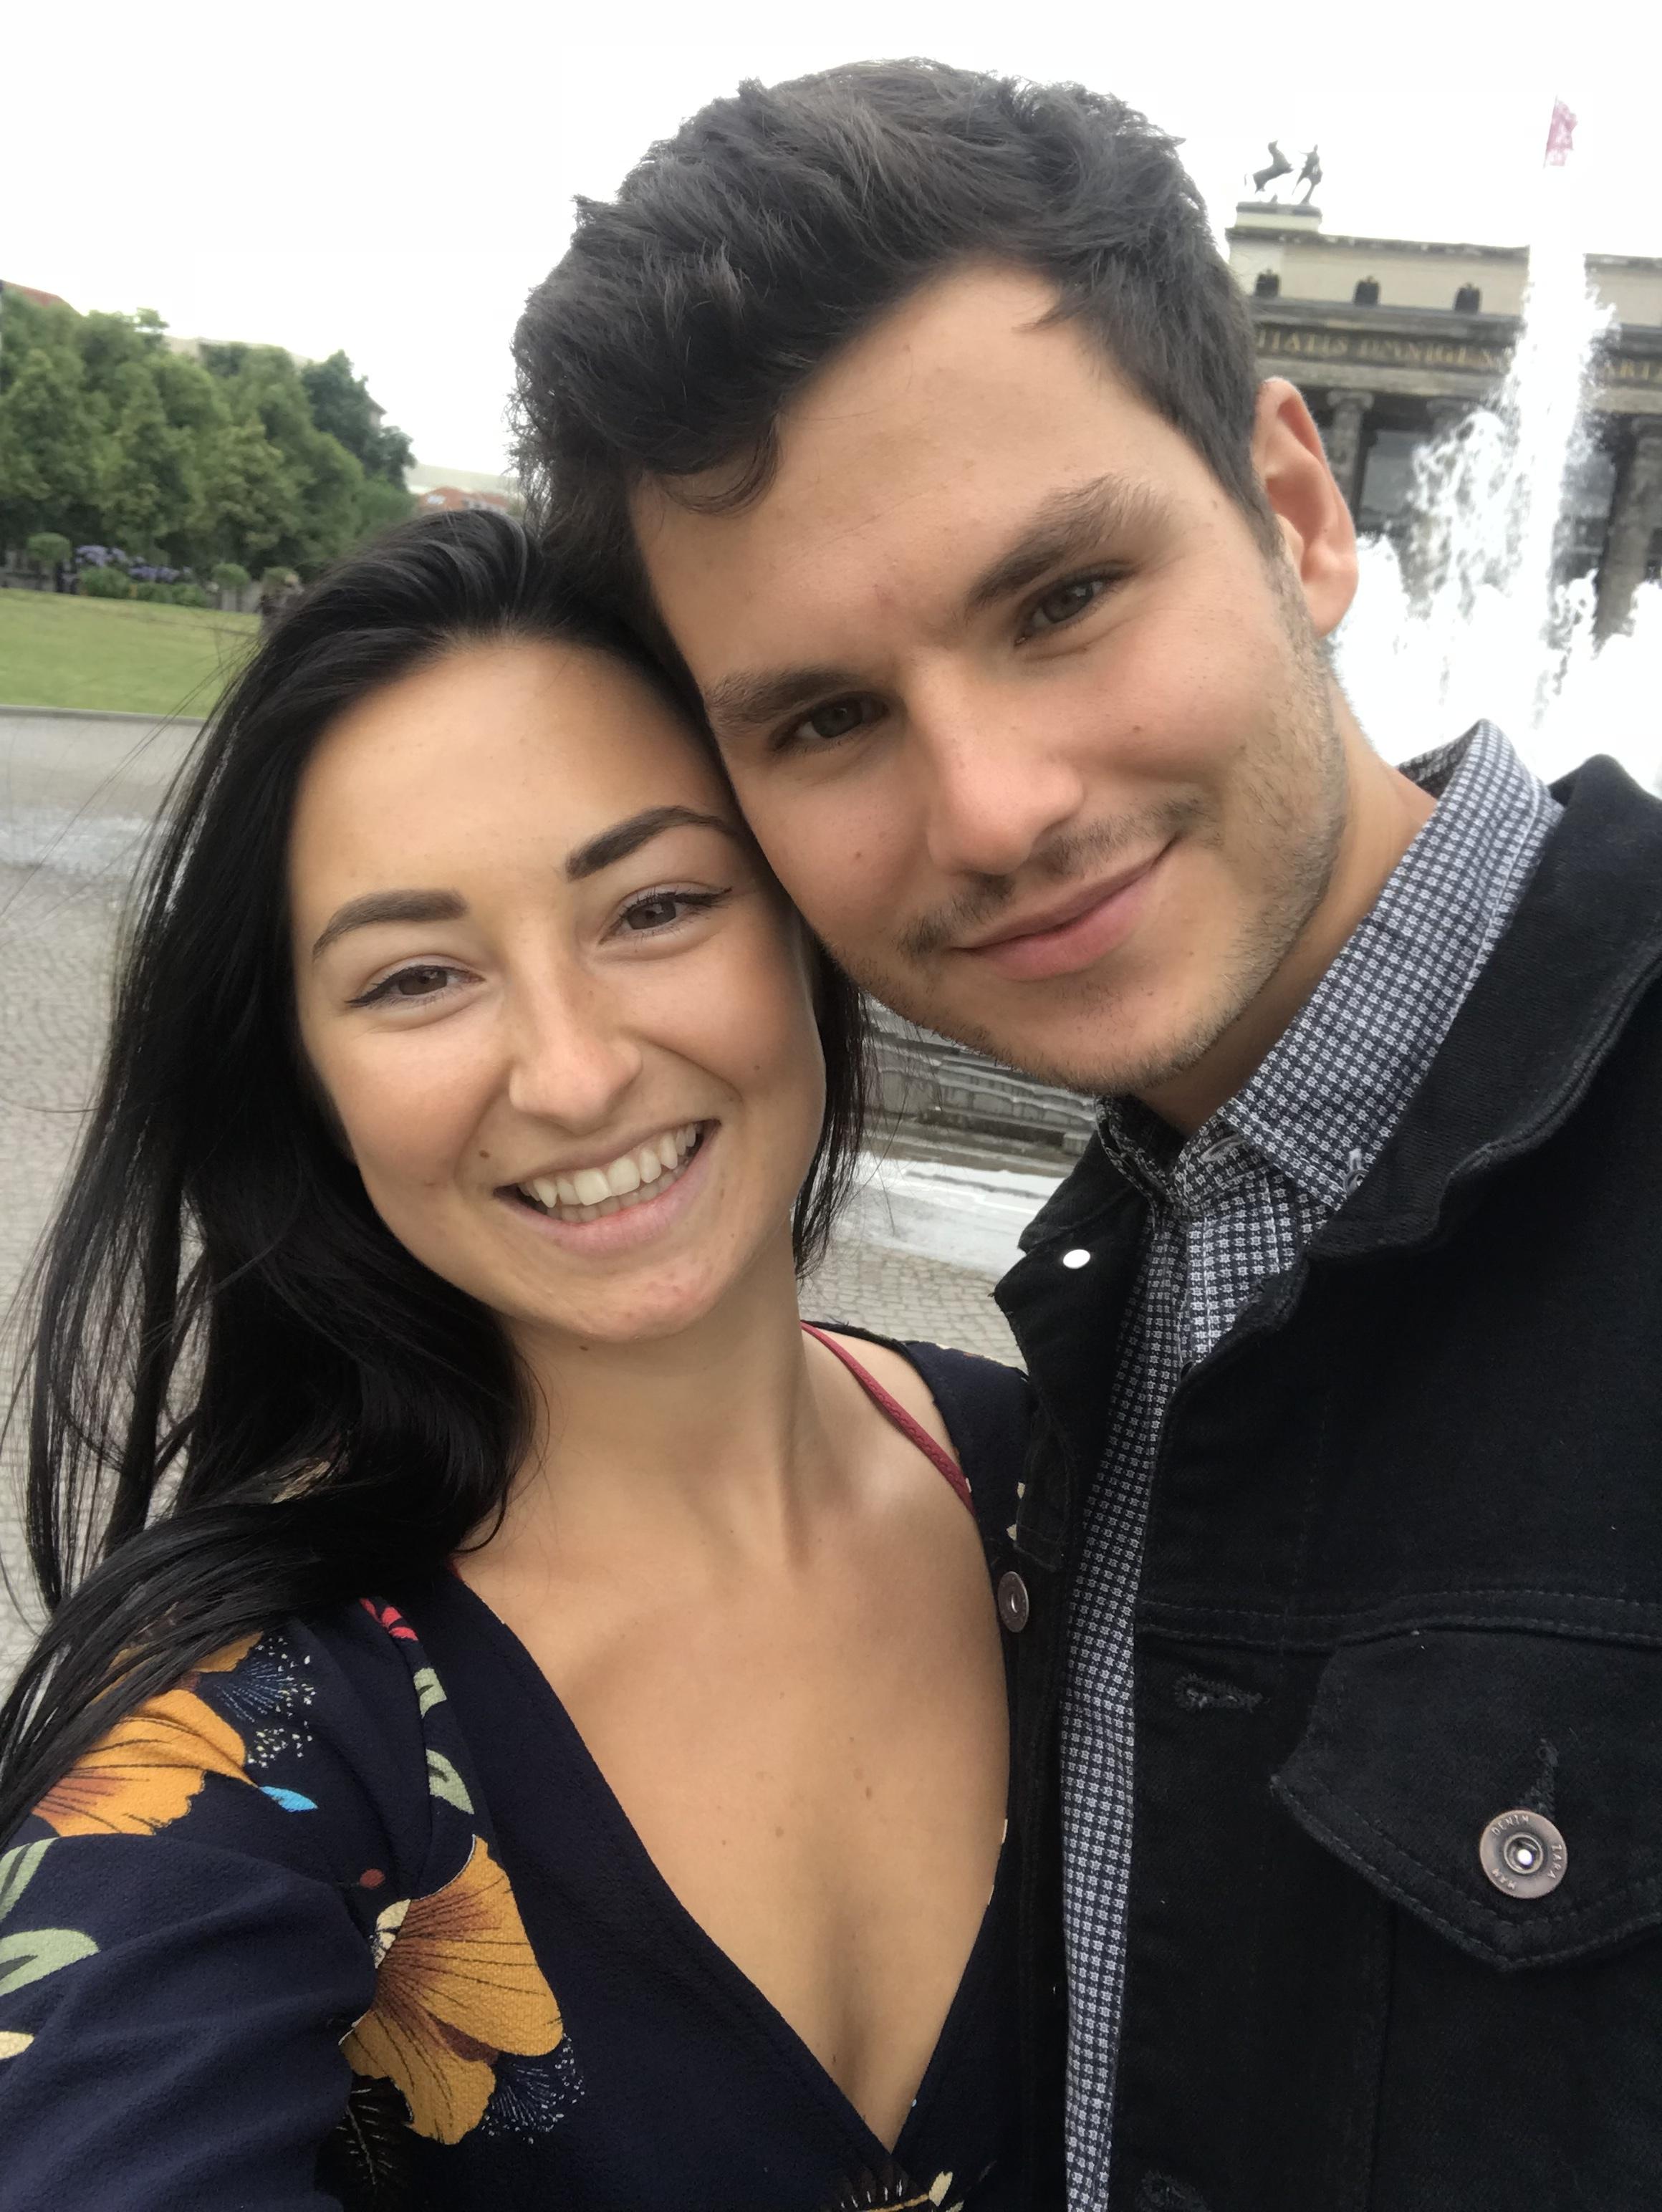 My wonderful boyfriend and I in Berlin.